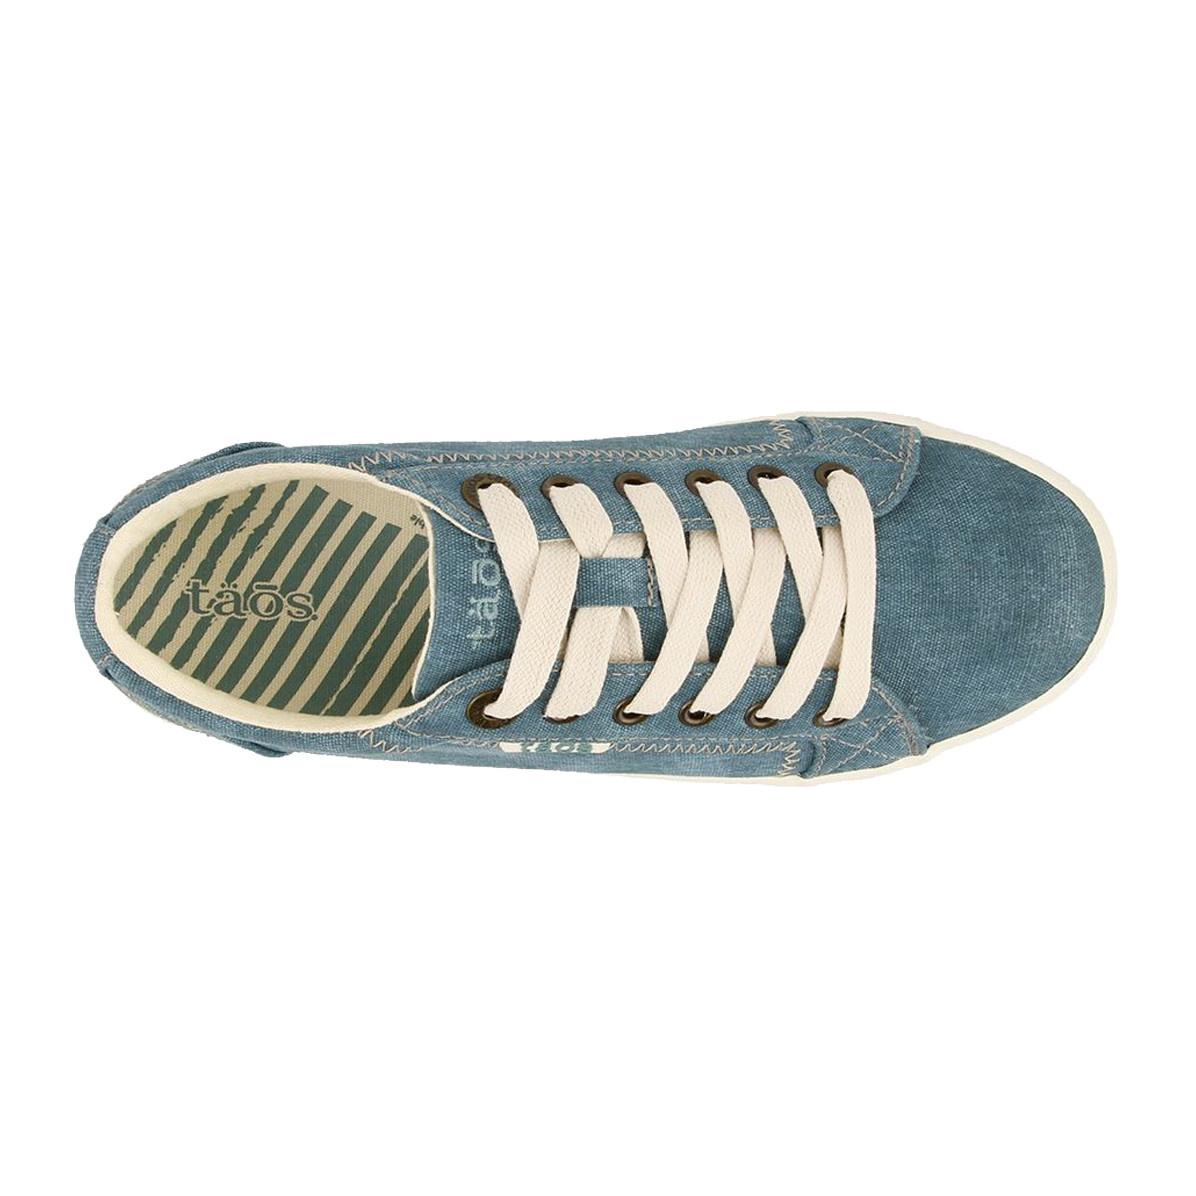 Taos Footwear Taos Women's Star Teal Sneaker